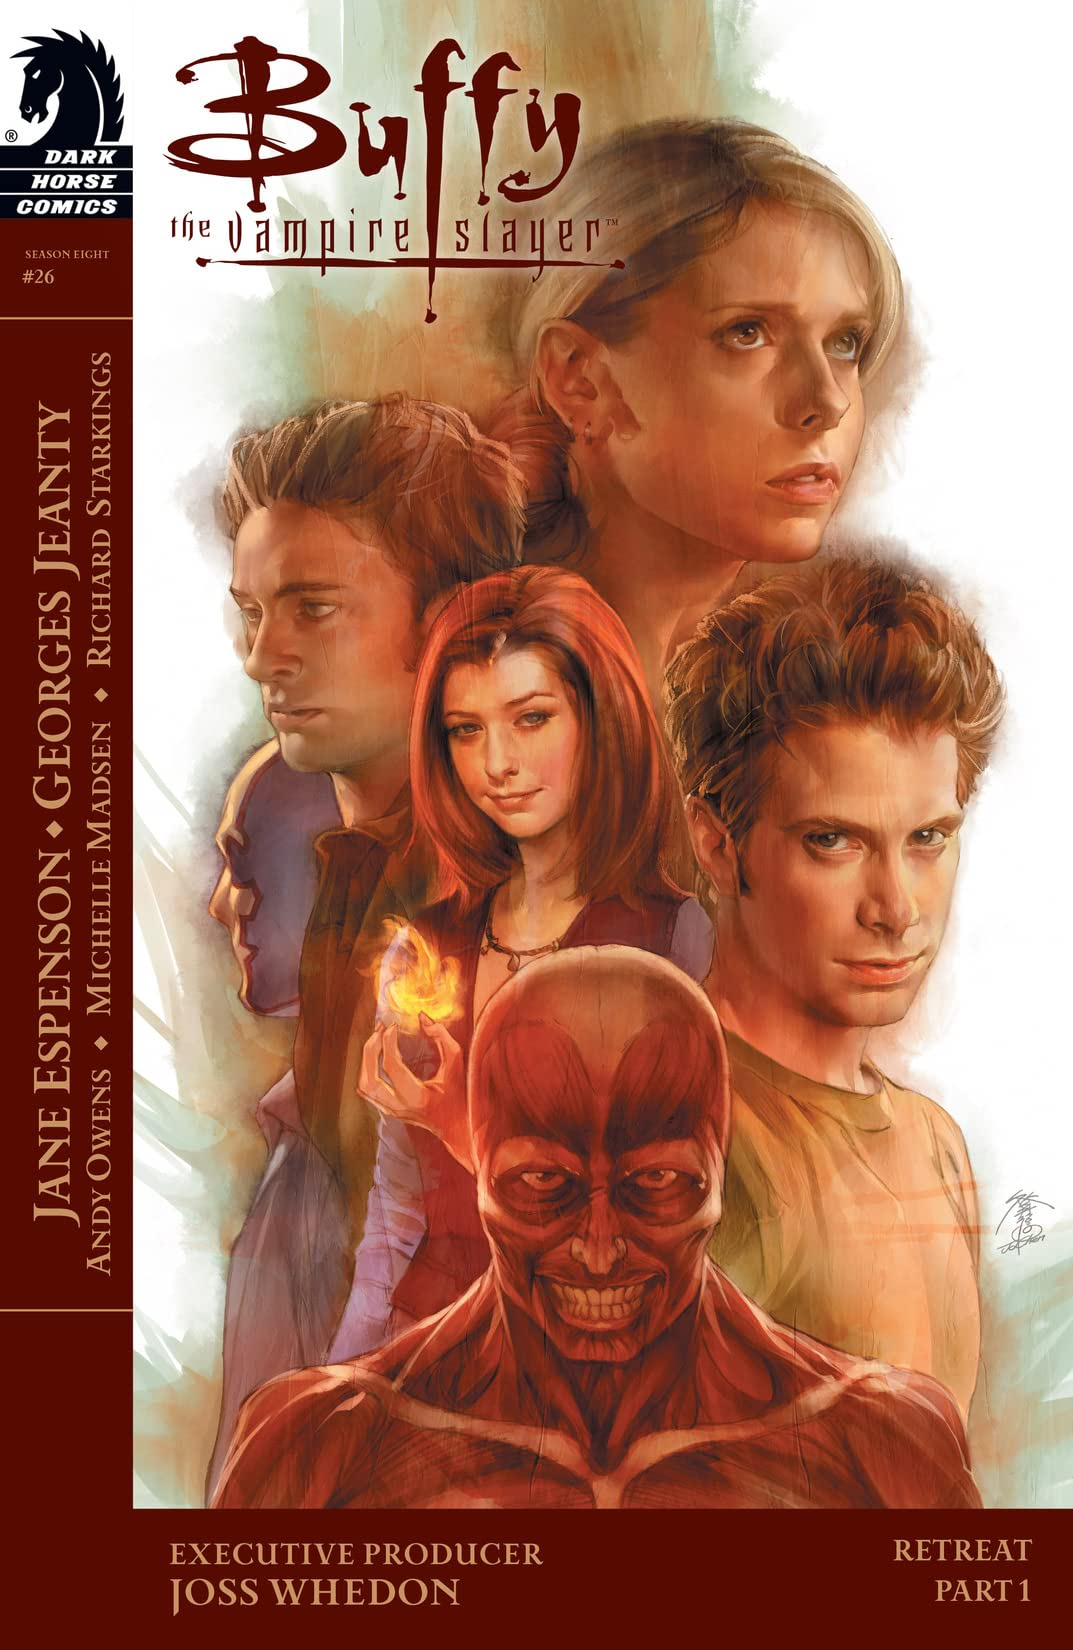 Buffy the Vampire Slayer: Season 8 #26